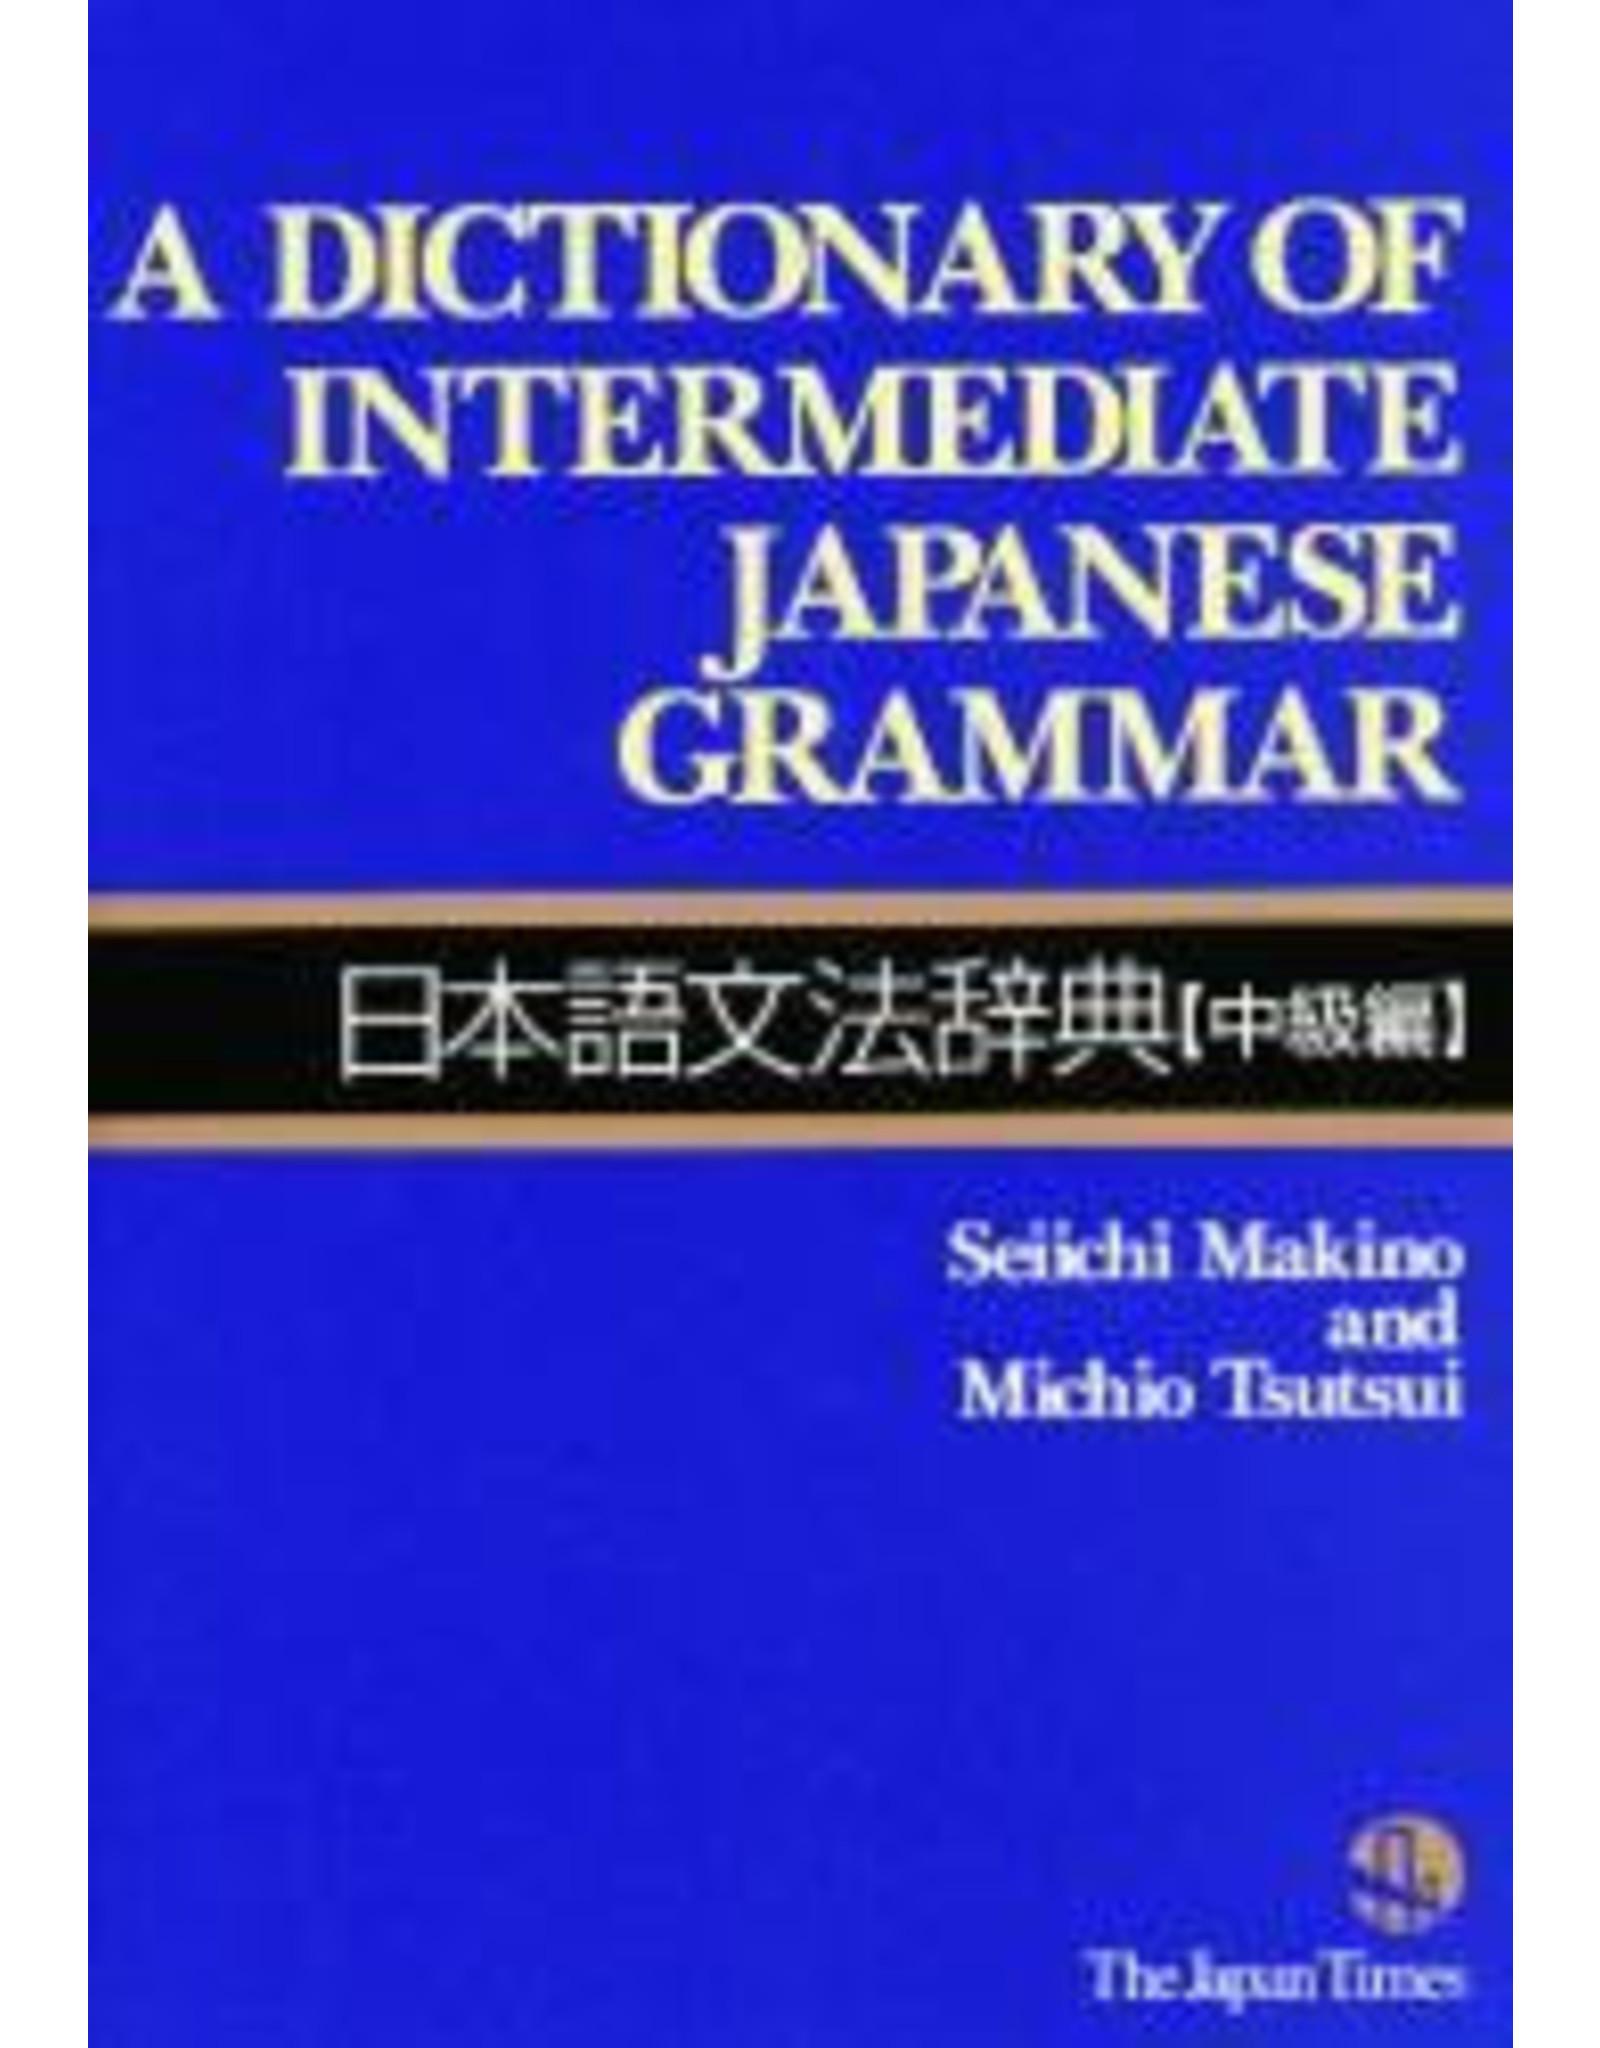 JAPAN TIMES DICTIONARY OF INTERMEDIATE JAPANESE GRAMMAR, A